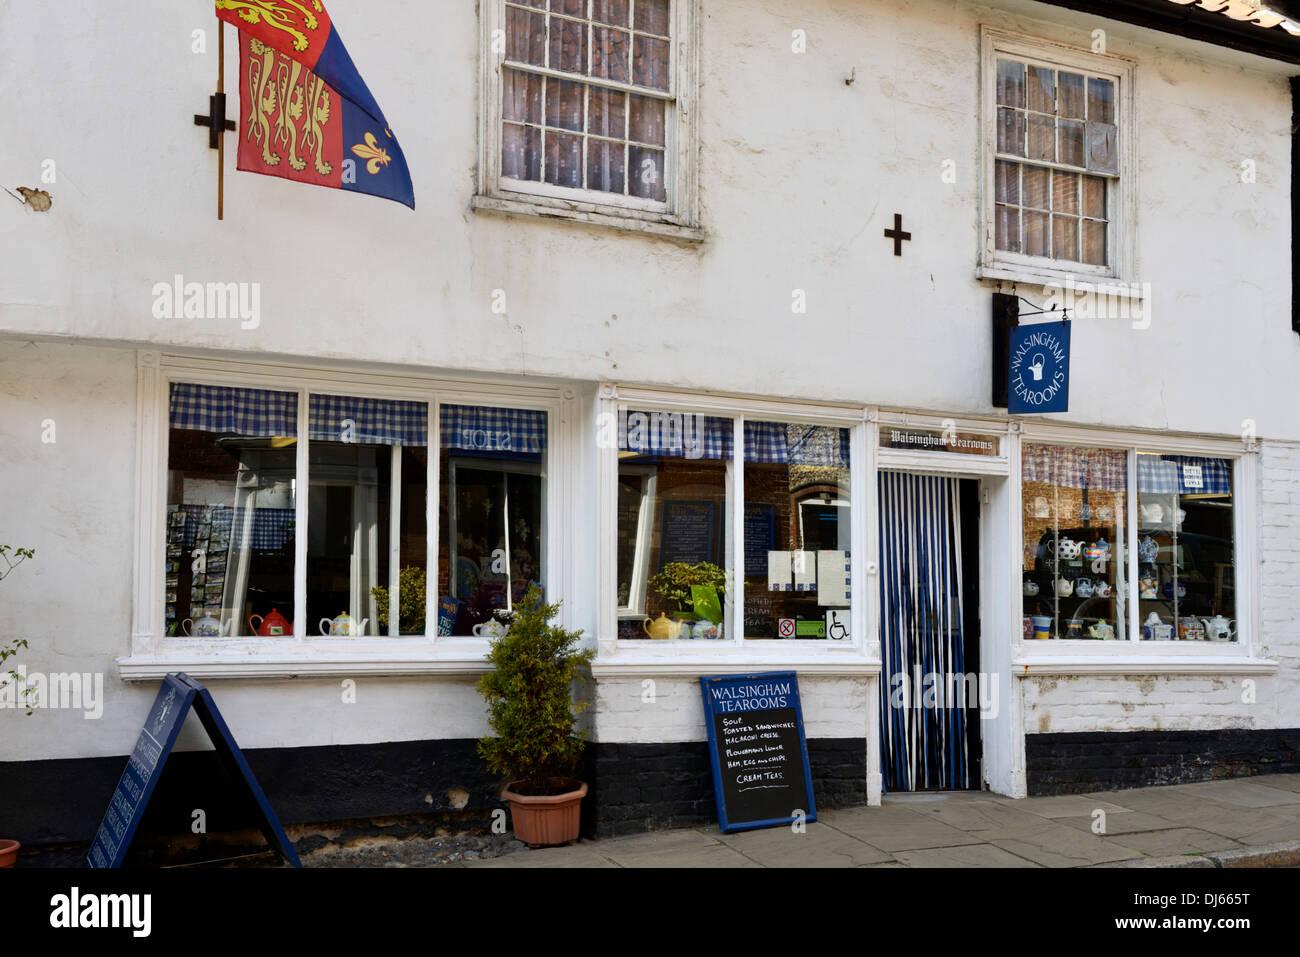 Tearooms, High Street, Little Walsingham, Norfolk, England, United Kingdom, UK, Europe Stock Photo